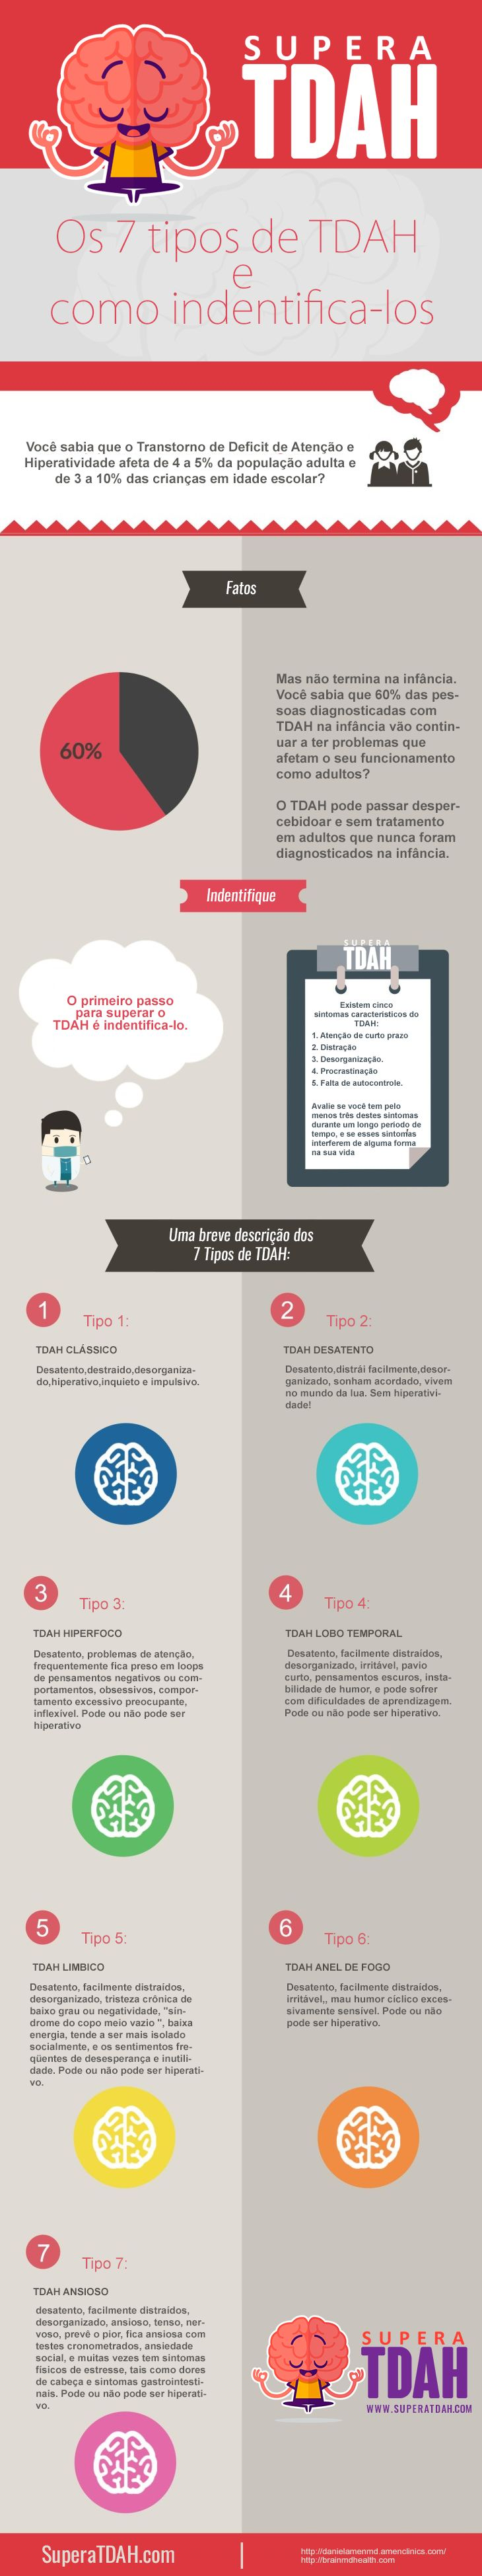 7 tipos de tdah infografico